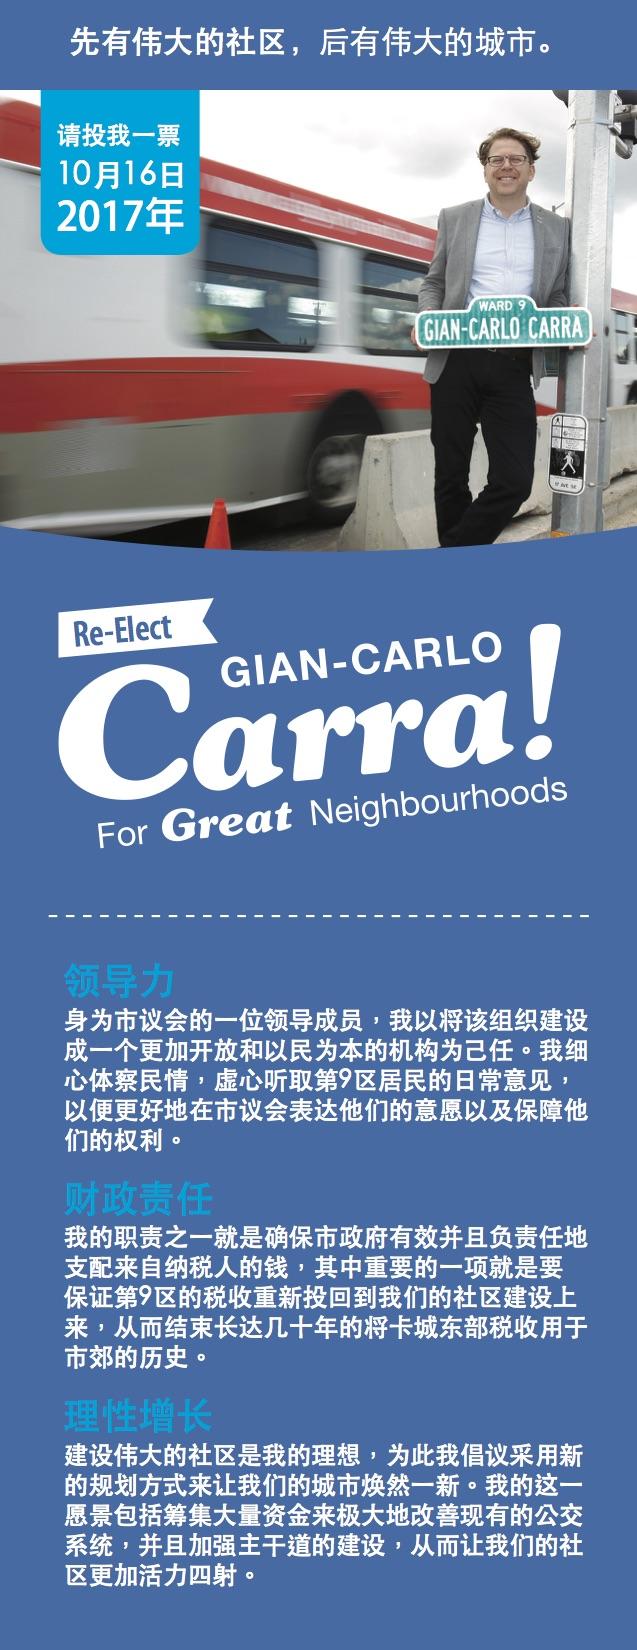 Re-Elect_Gian-Carlo_Carra_(Chinese).jpg